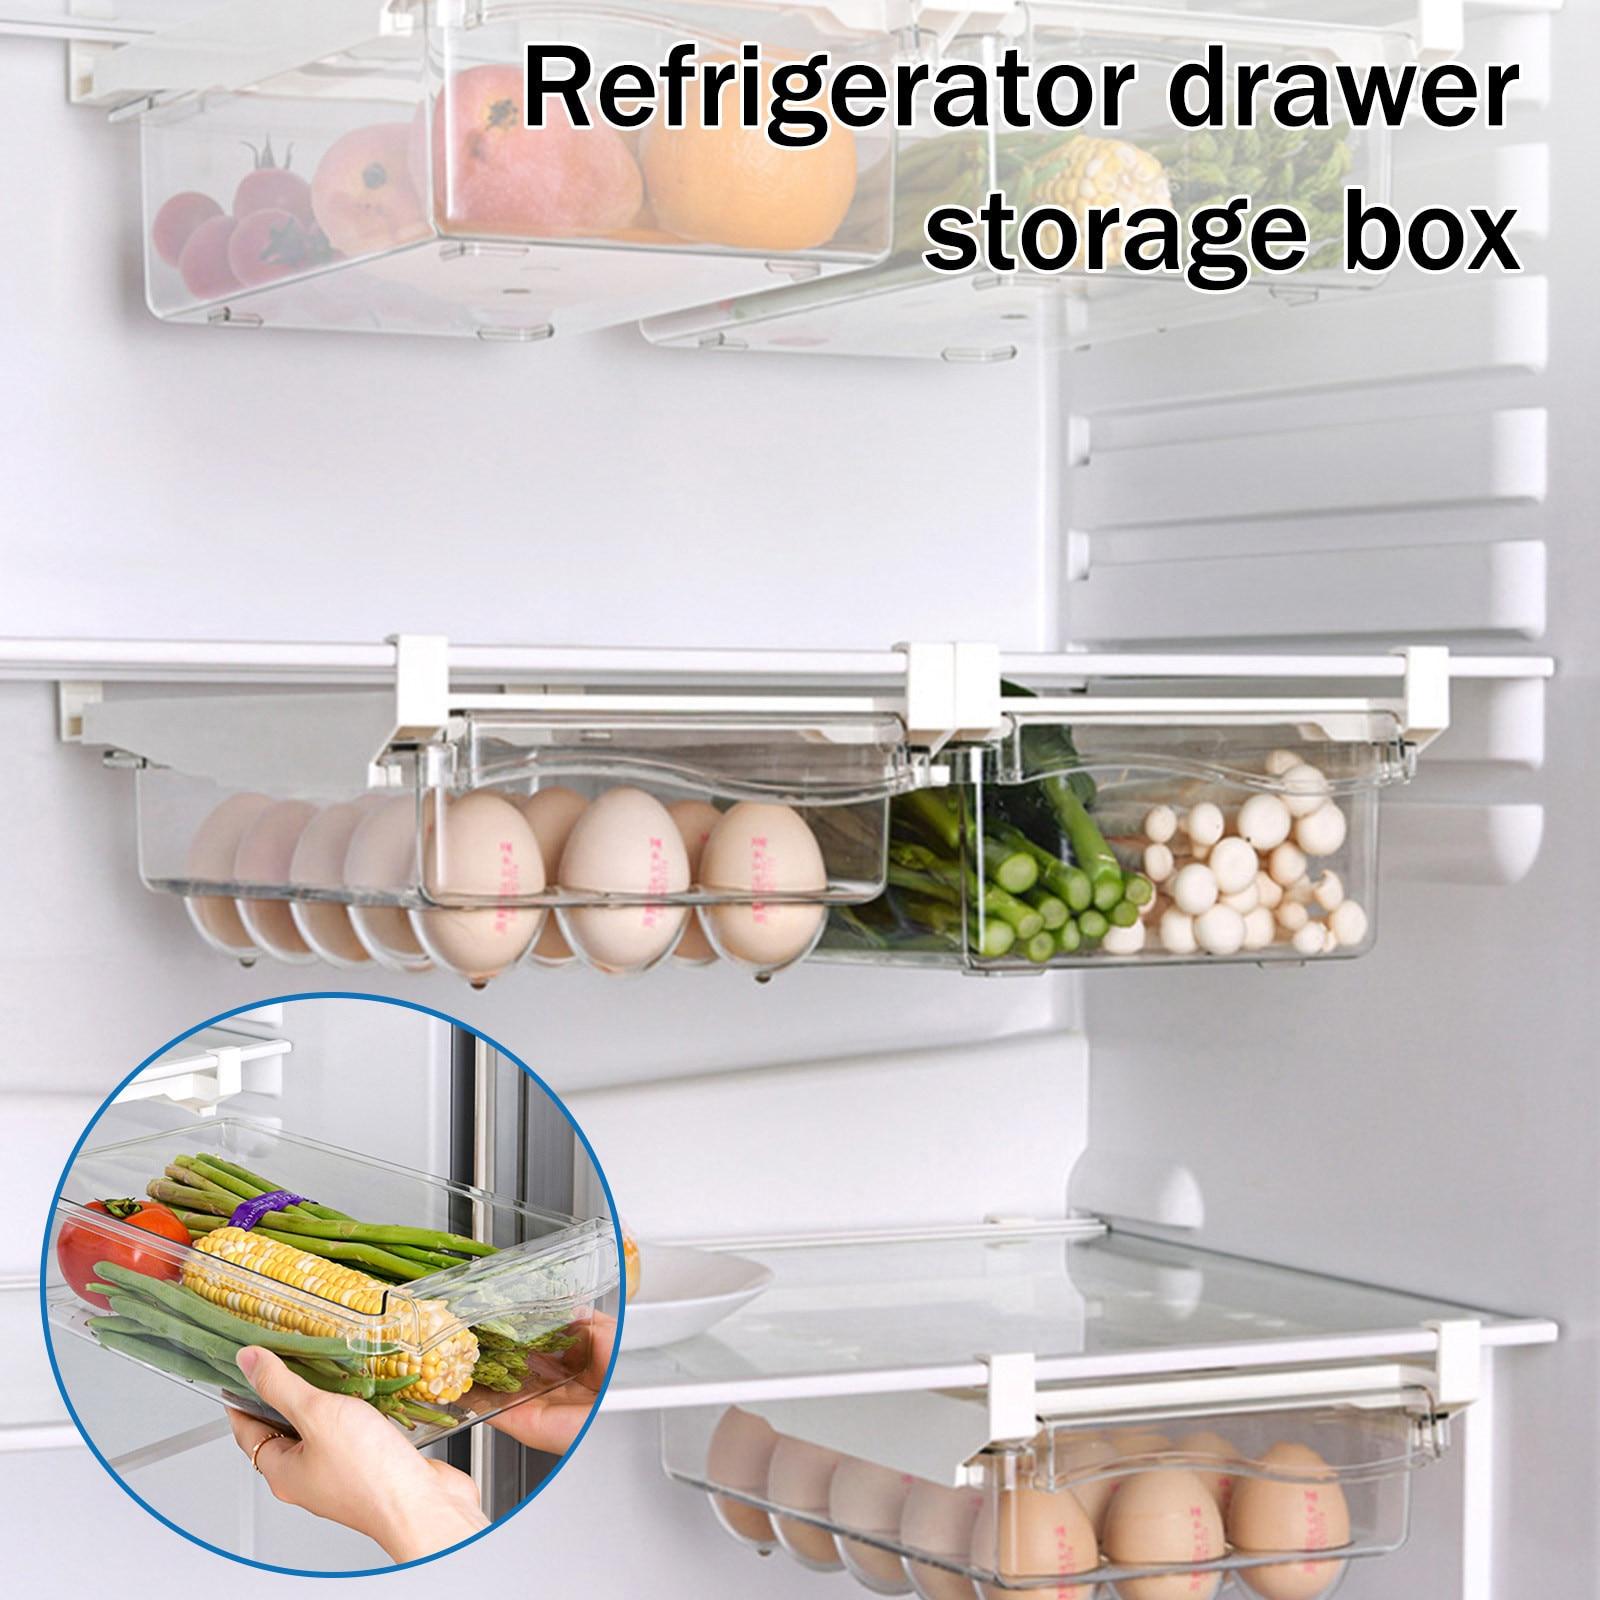 Fridge Drawer Organizer Fridge Organizer Adjustable Drawer Fridge Storage Box Containers Pantry Freezer Storage Drawers Tools